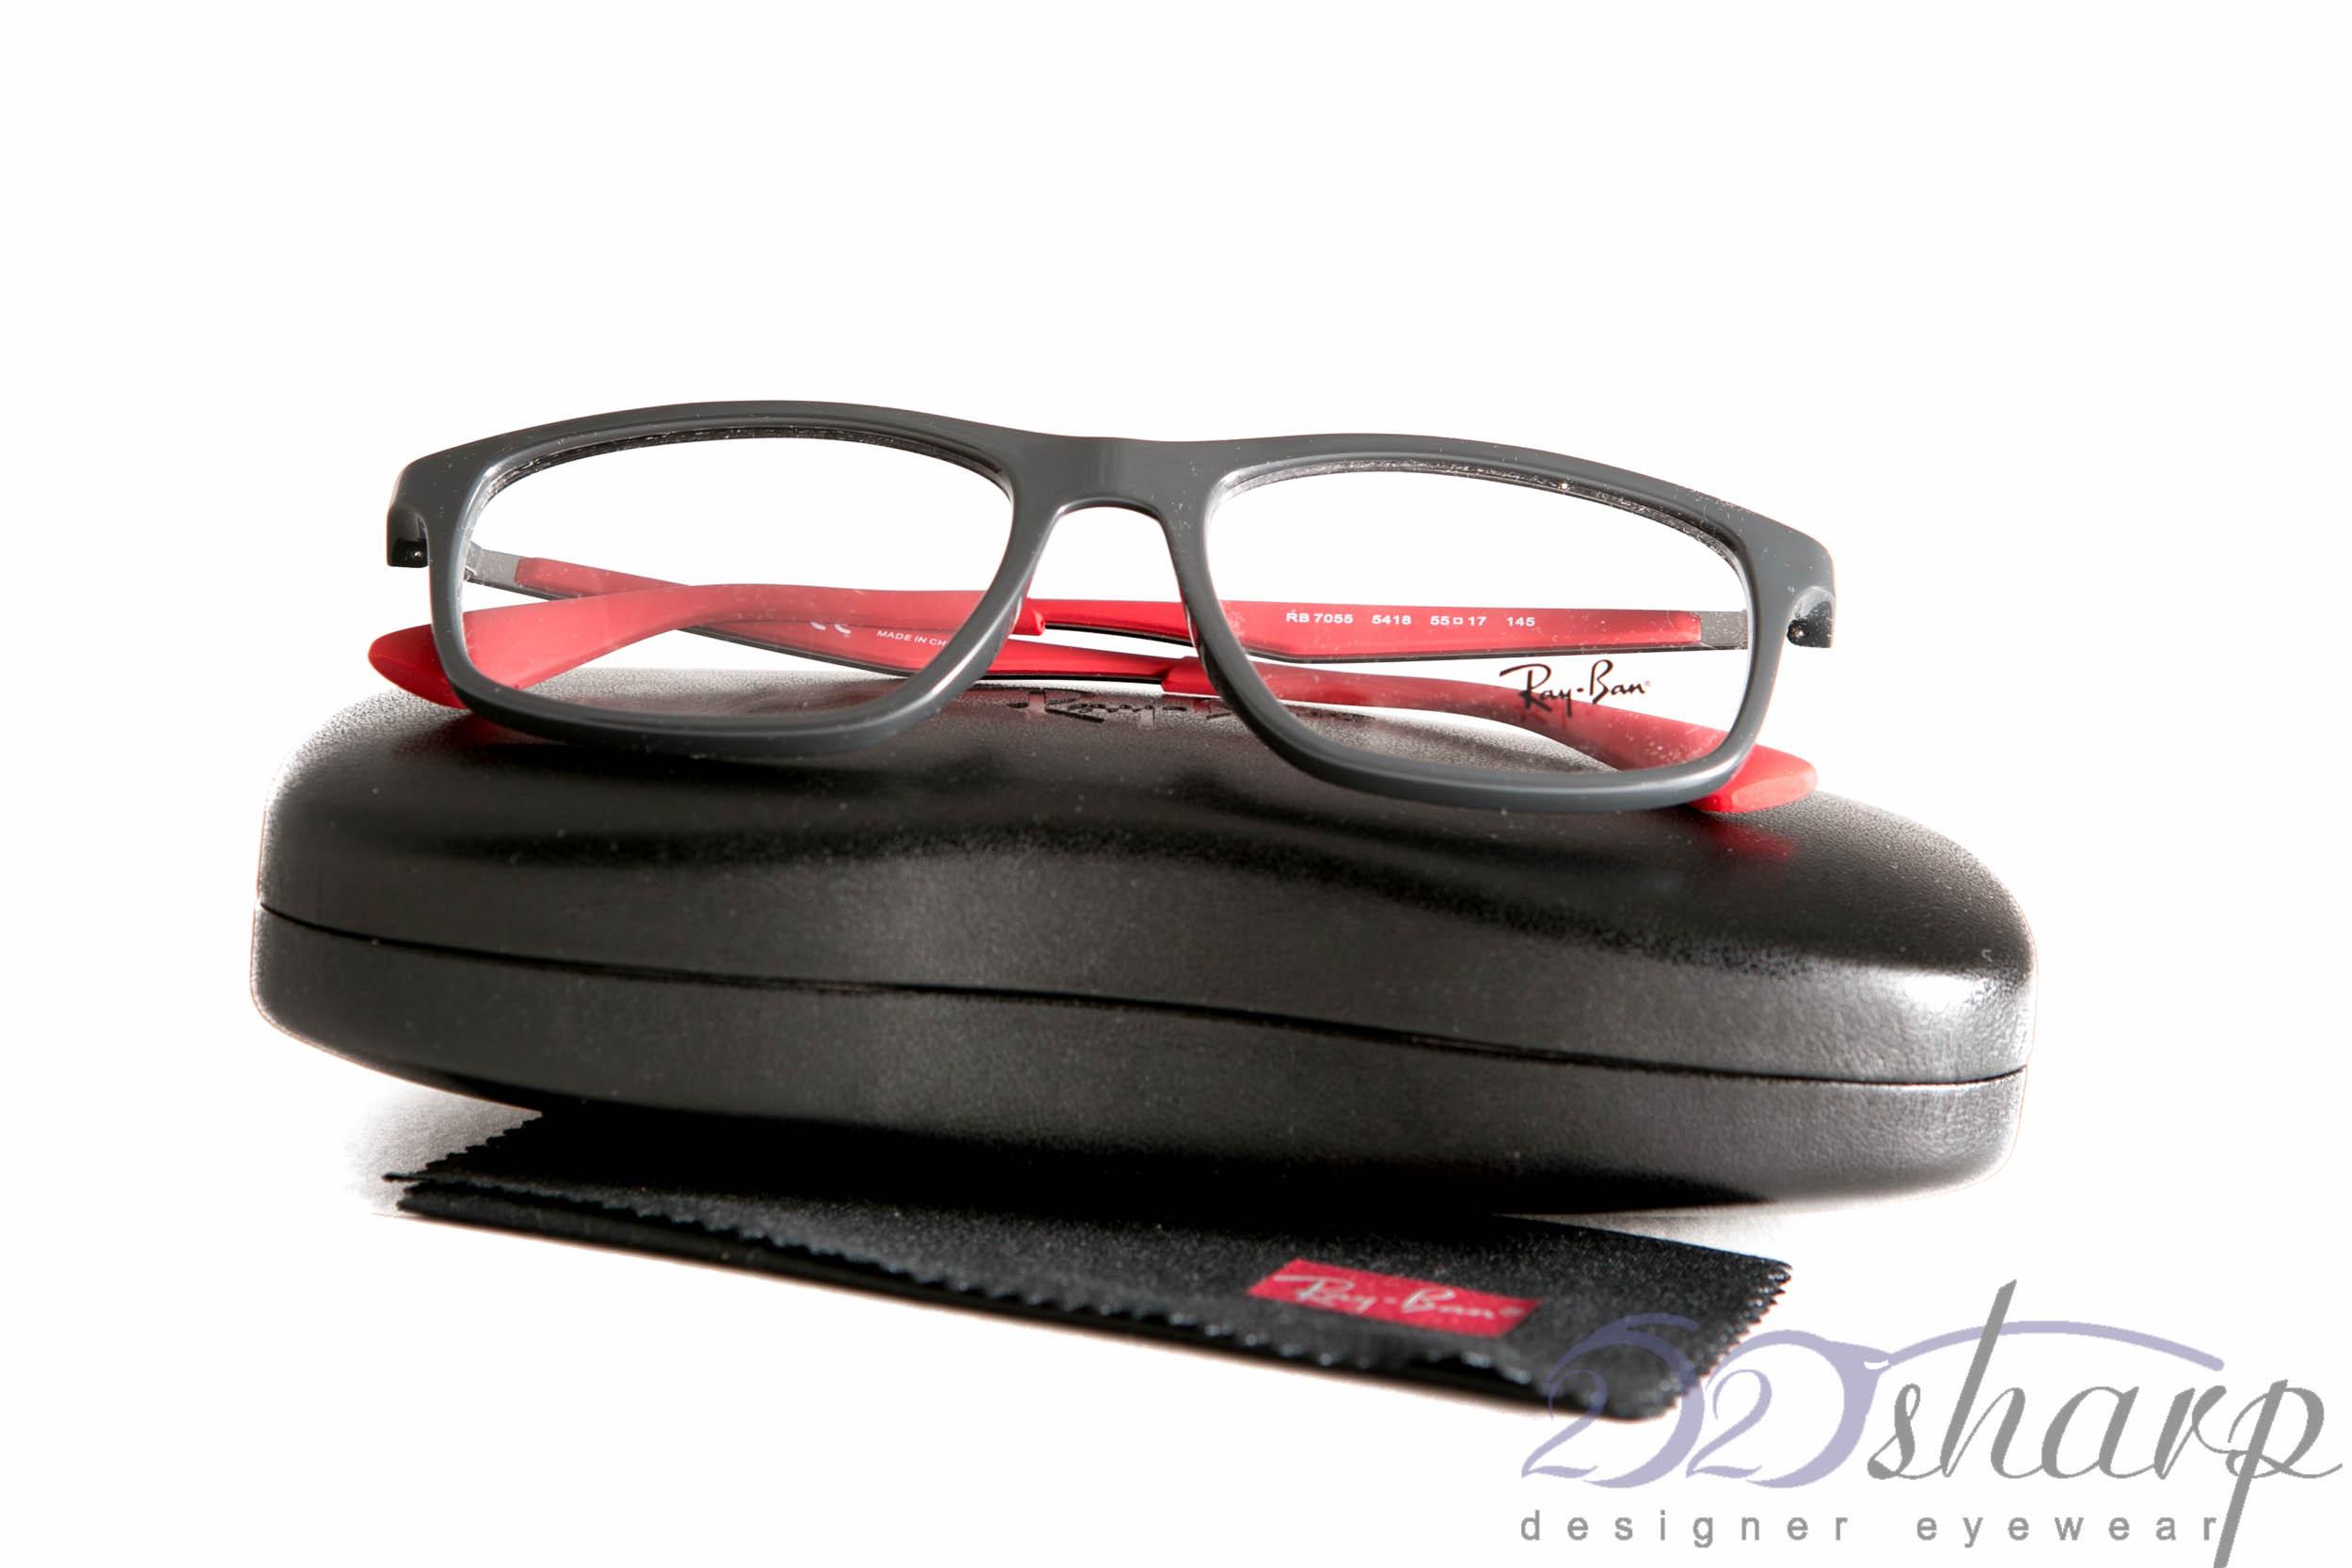 34271de587 We can make high quality lenses for your frames.